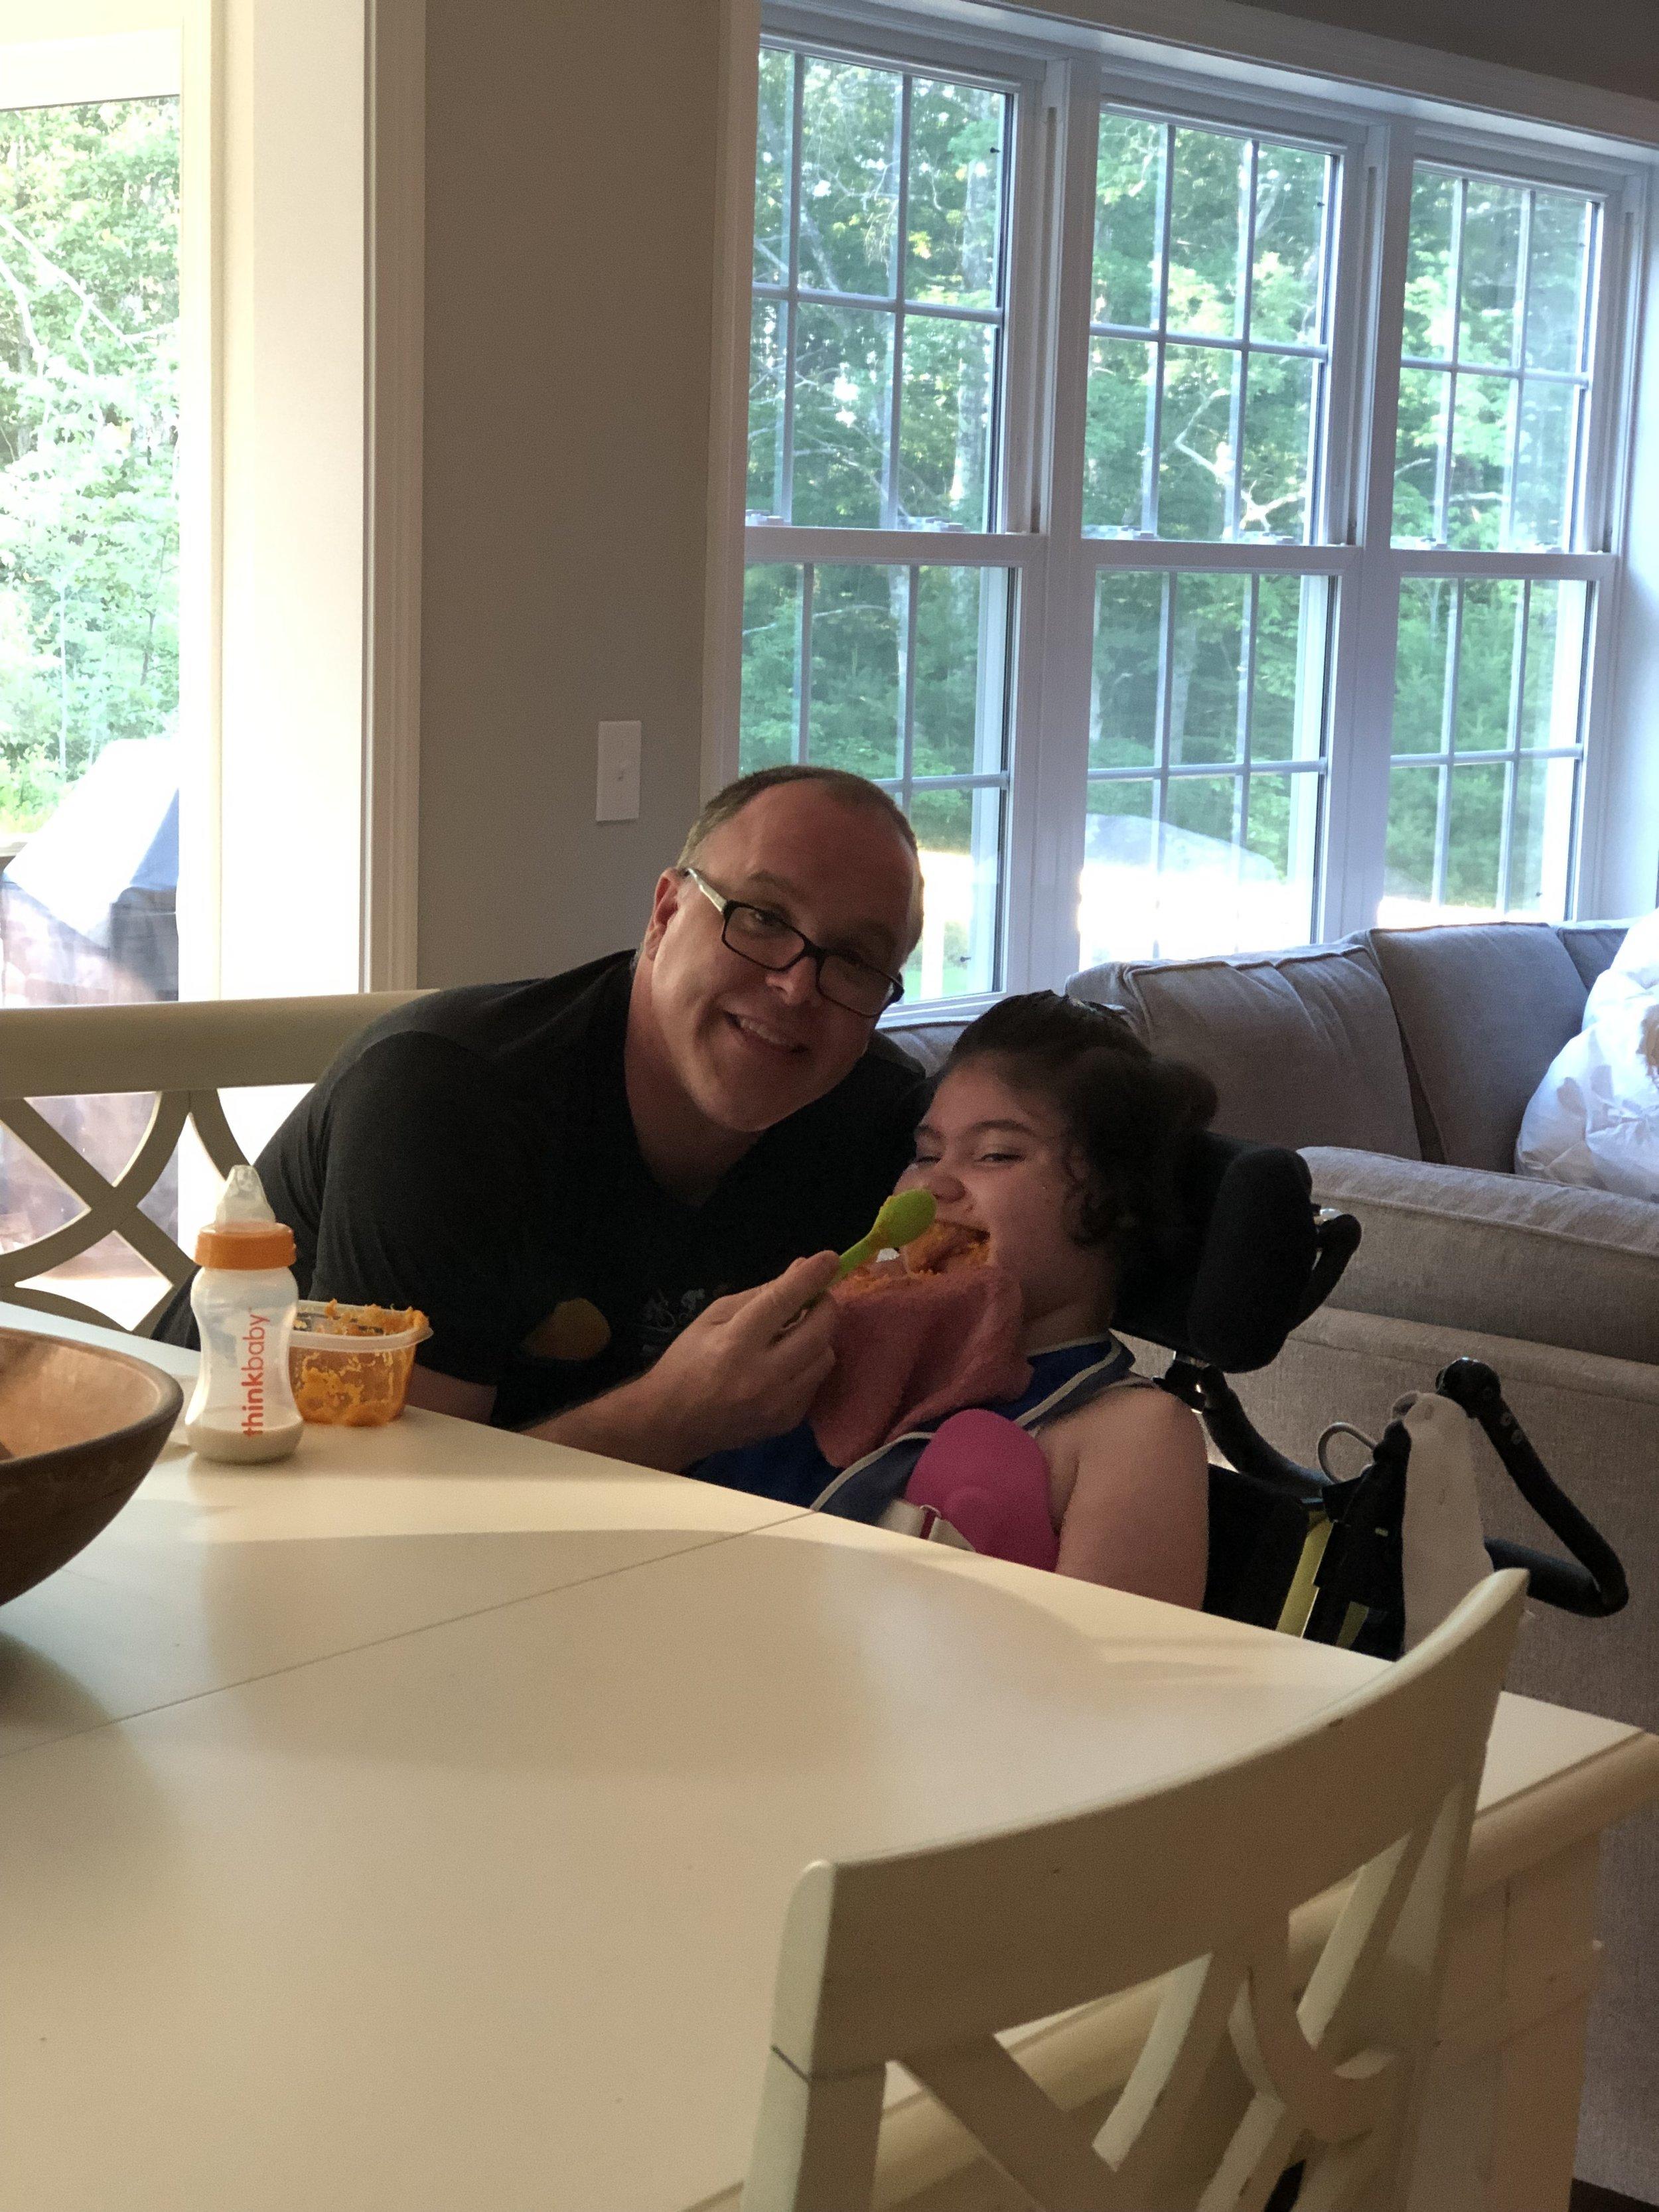 Meredith Lewis - FOXG1 - Accessible Home.JPG